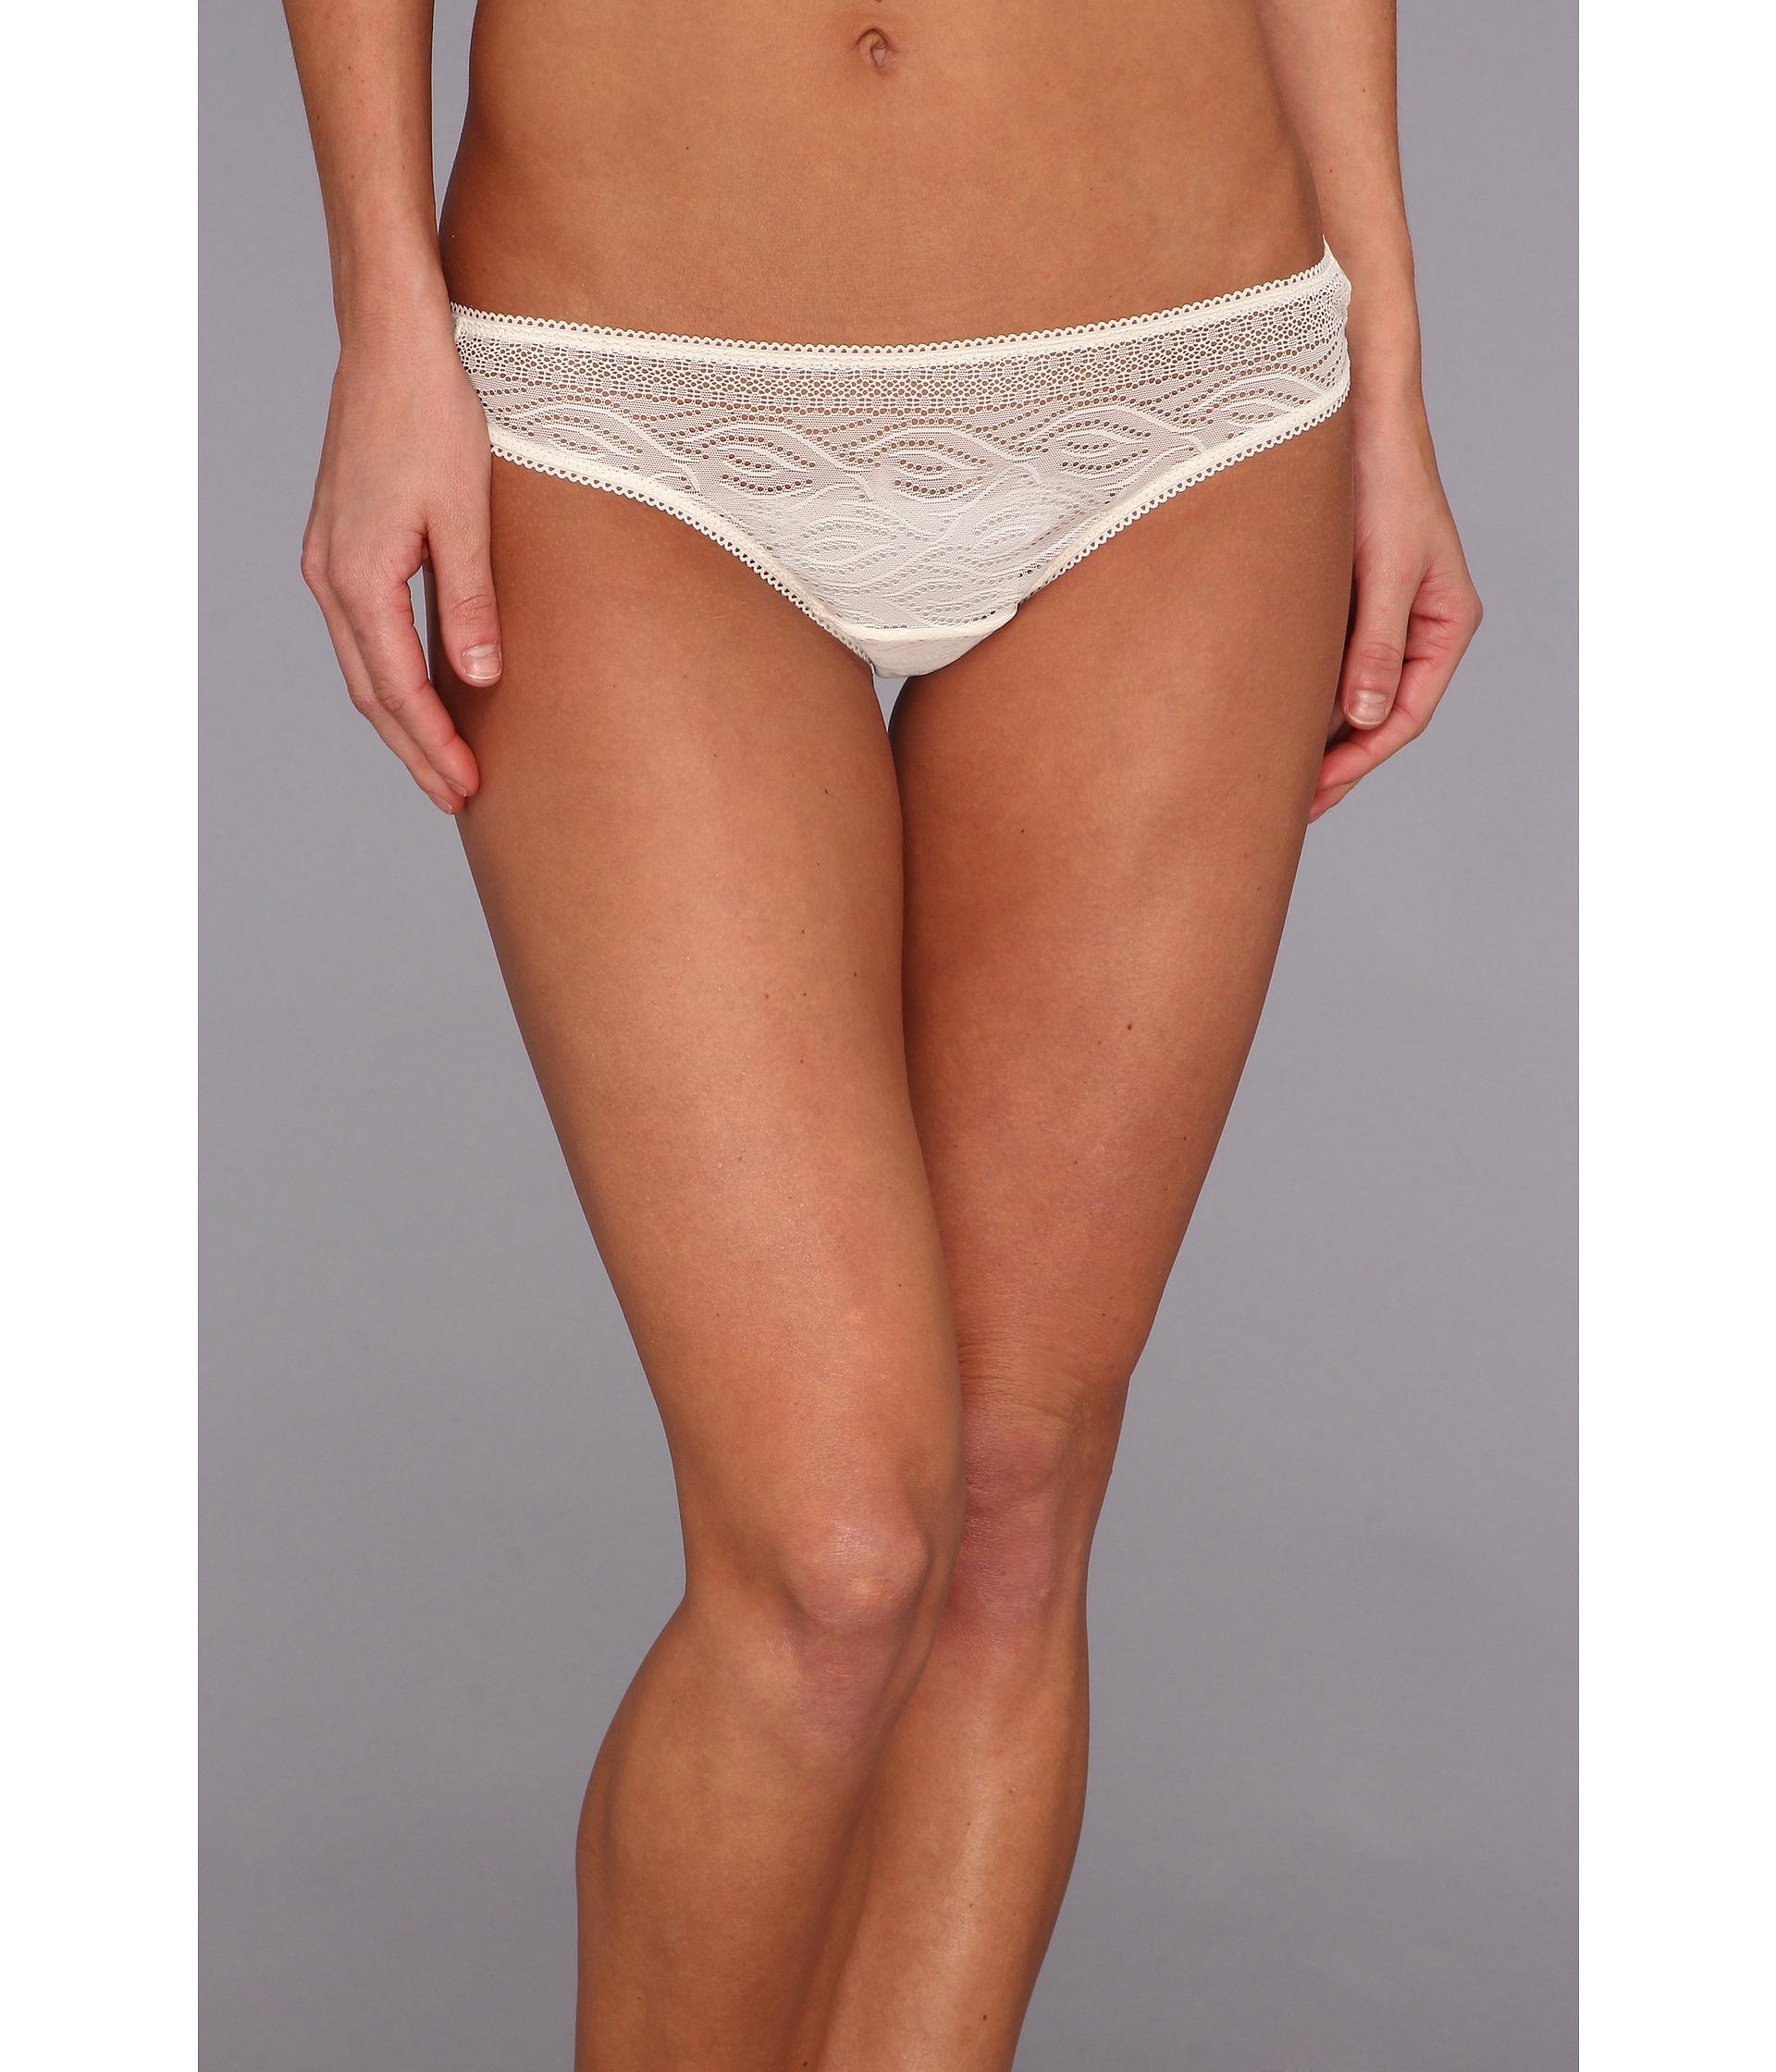 Emily Riedel Bikini Gold Ongossamer - laced in paradise